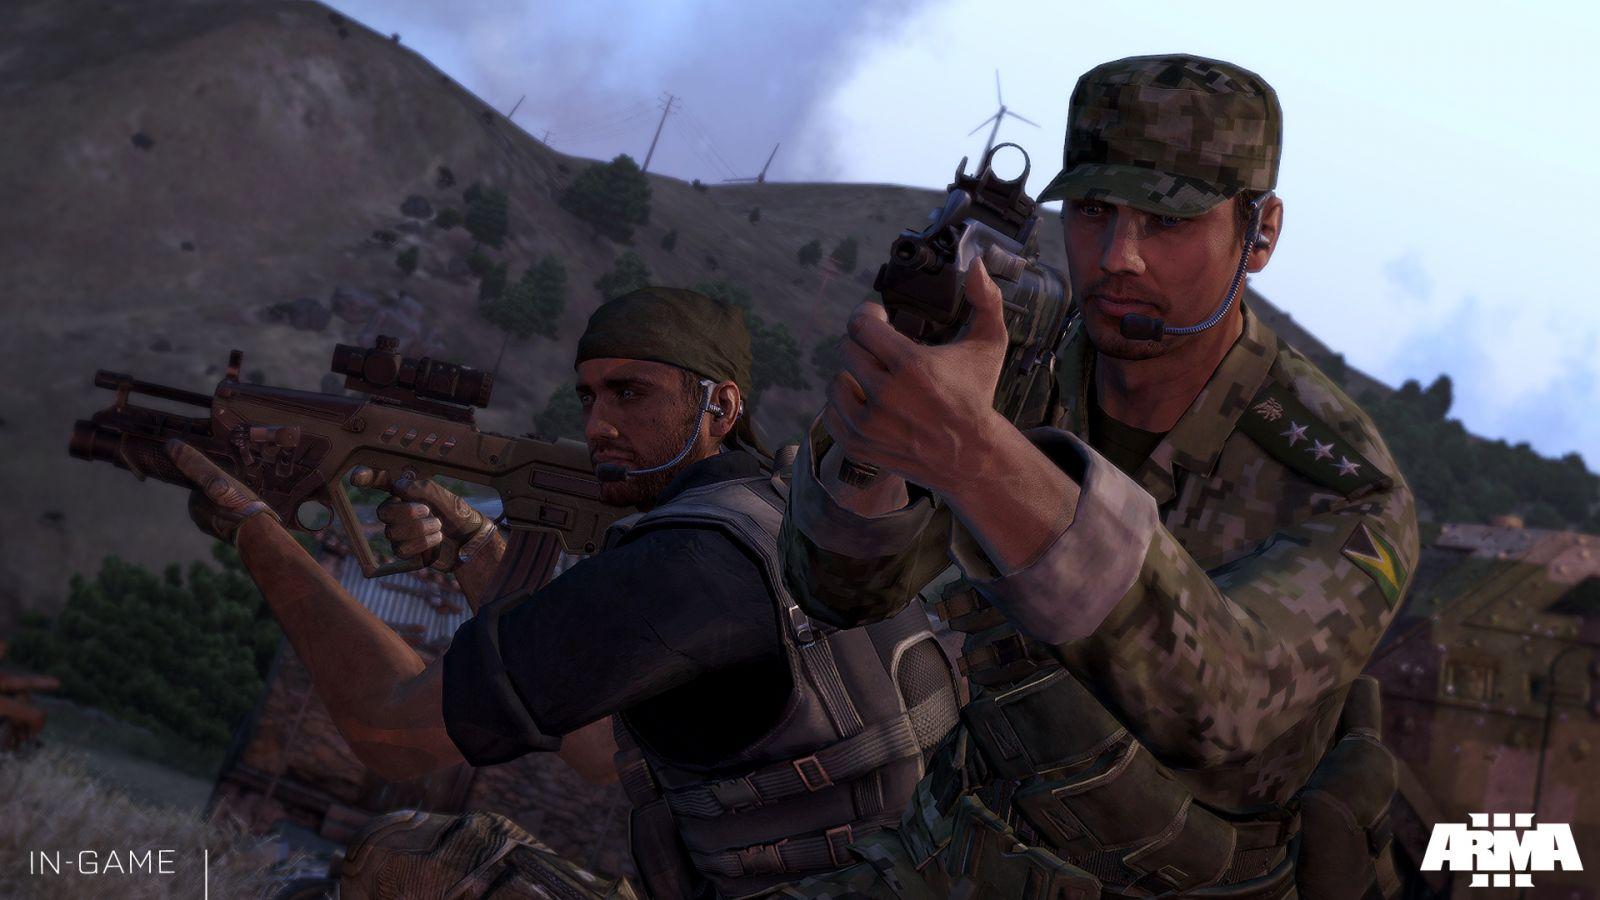 arma3 adapt screenshot 04